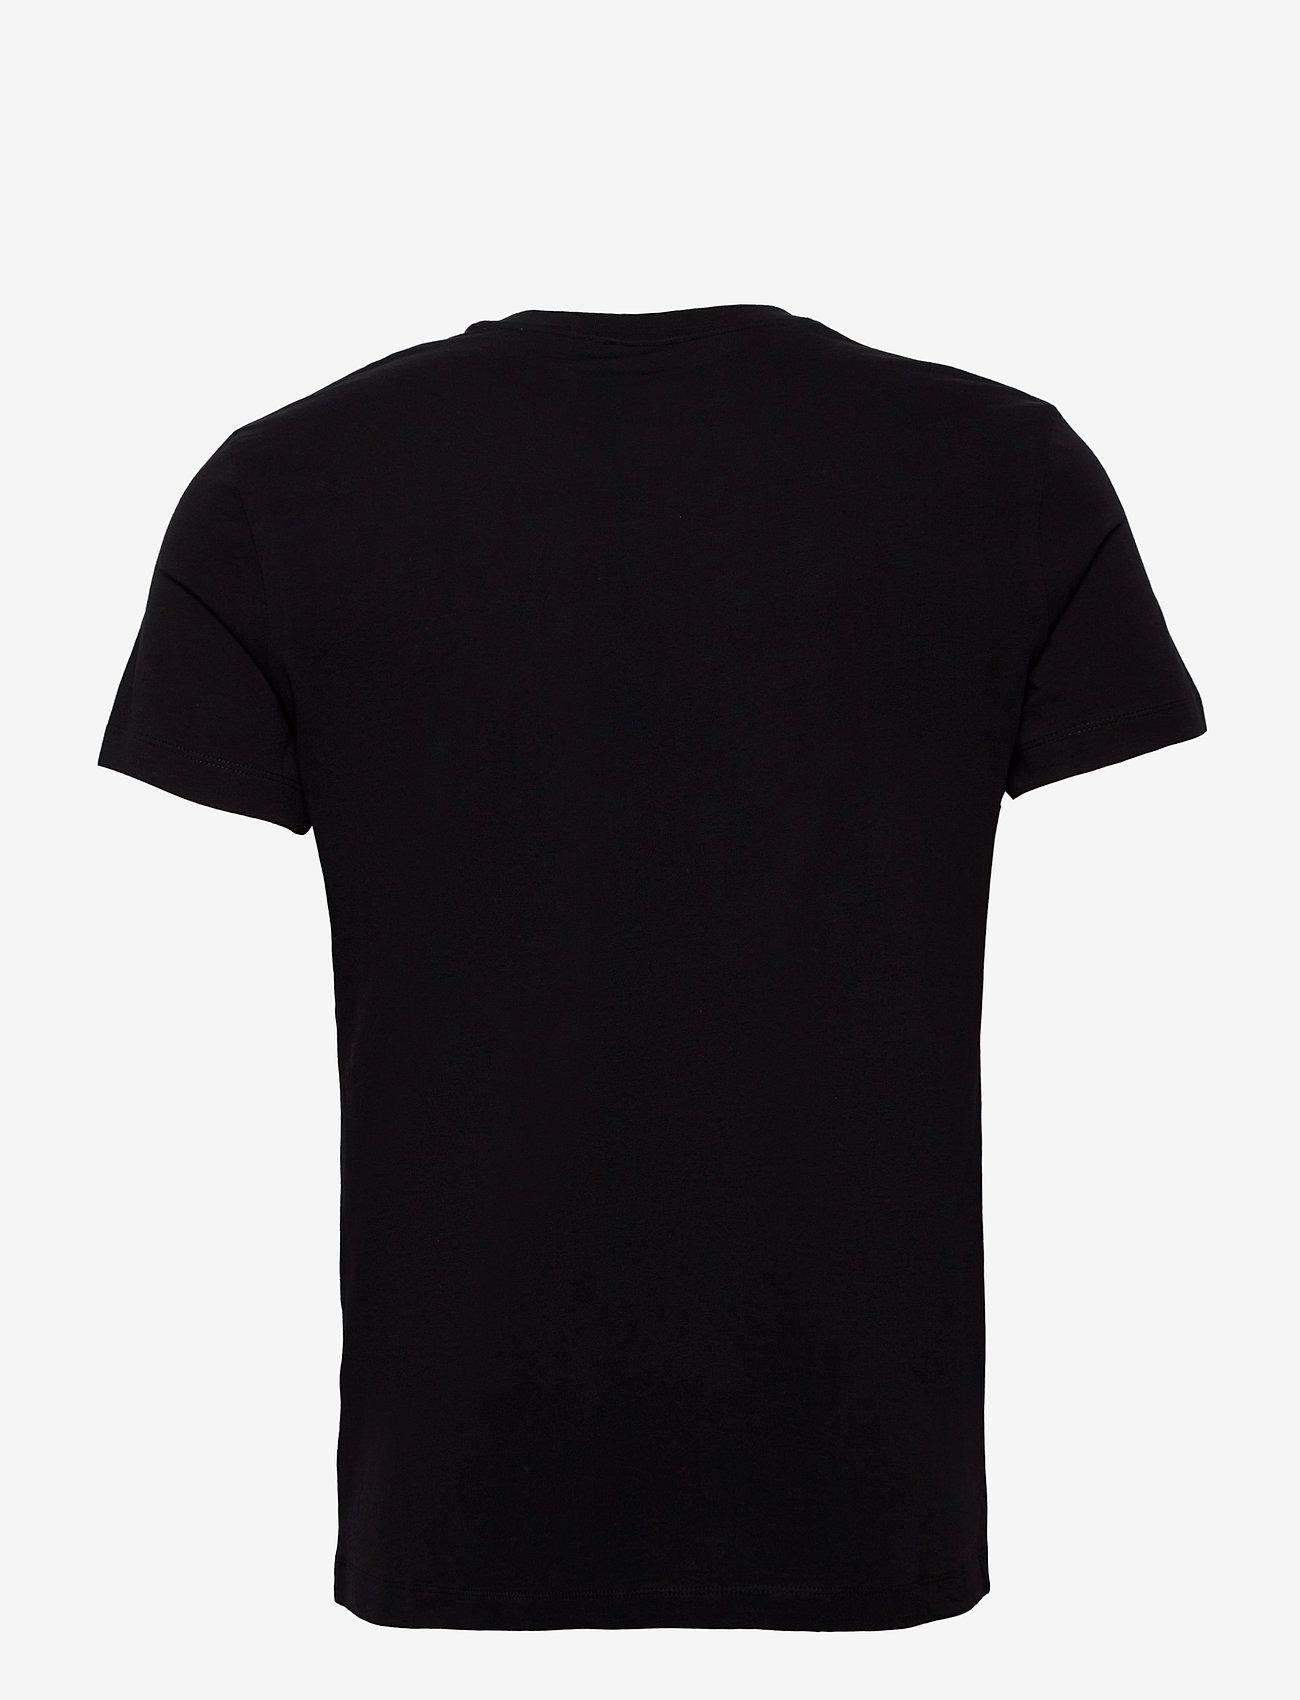 Björn Borg - TEE CENTRE CENTRE - basic t-shirts - black beauty - 1